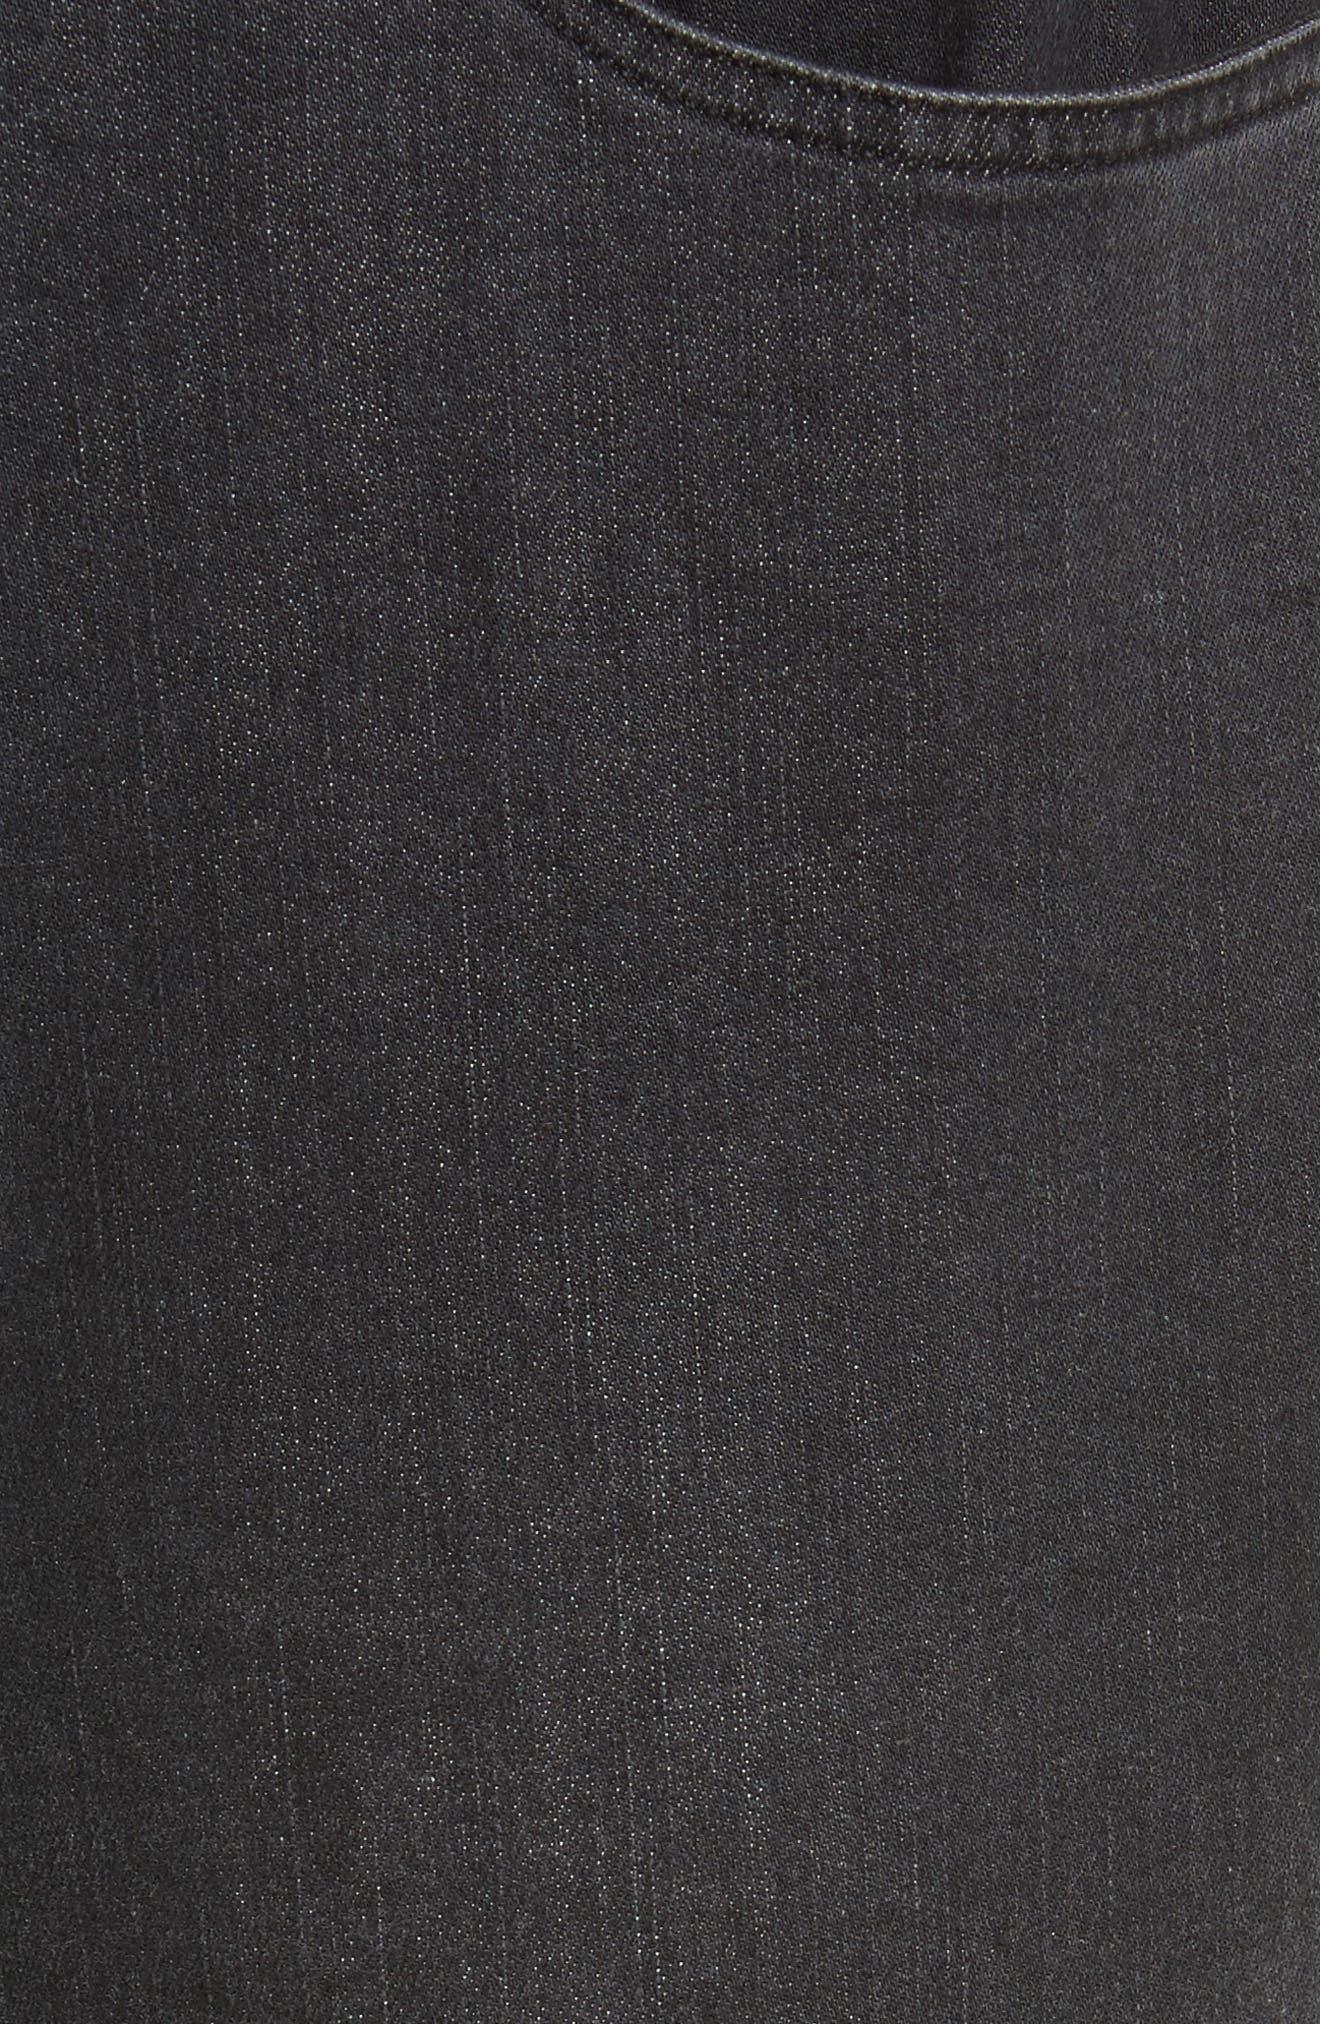 High Waist Slim Jeans,                             Alternate thumbnail 6, color,                             Black Rinse